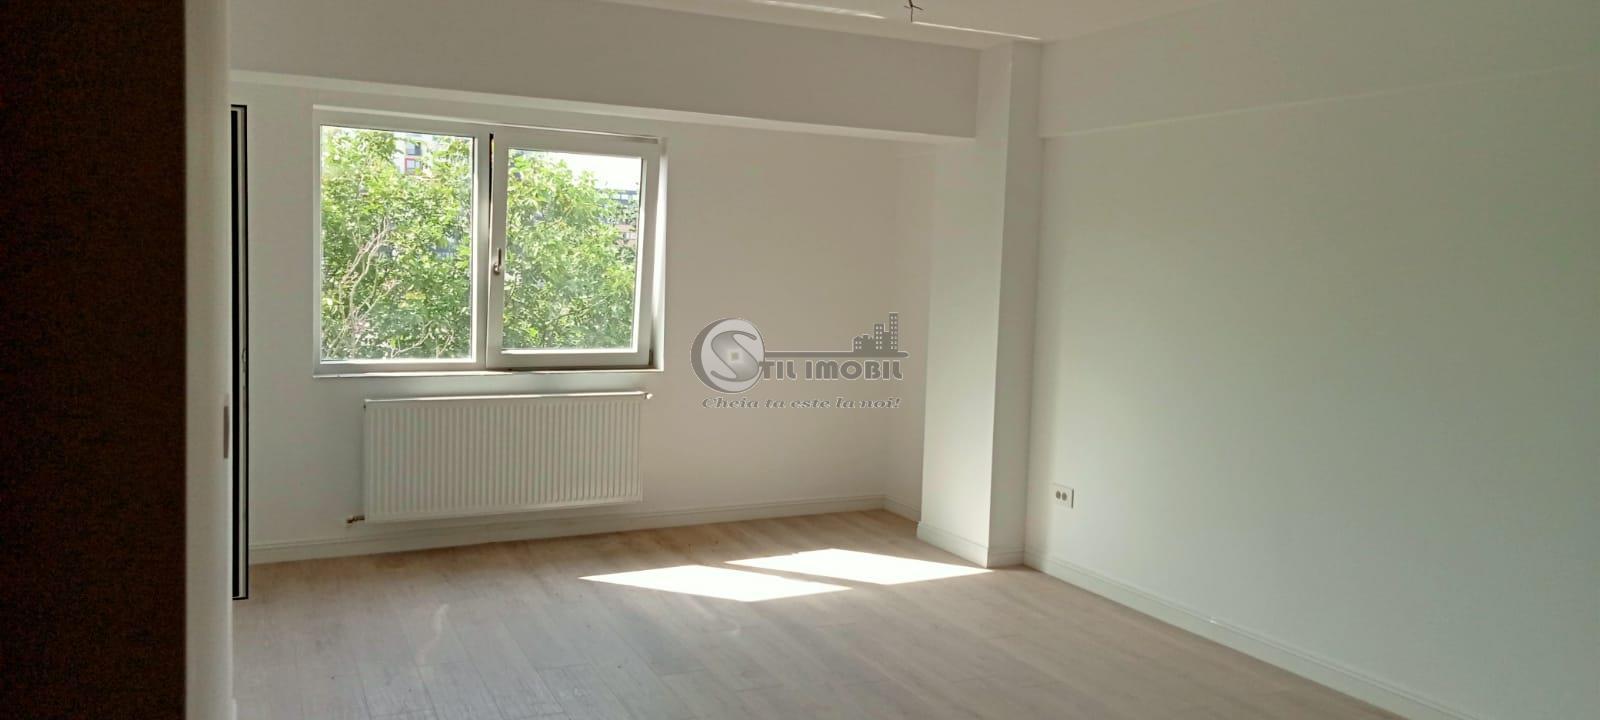 Apartament 1 camera, 41mp, decomandat, Tatarasi